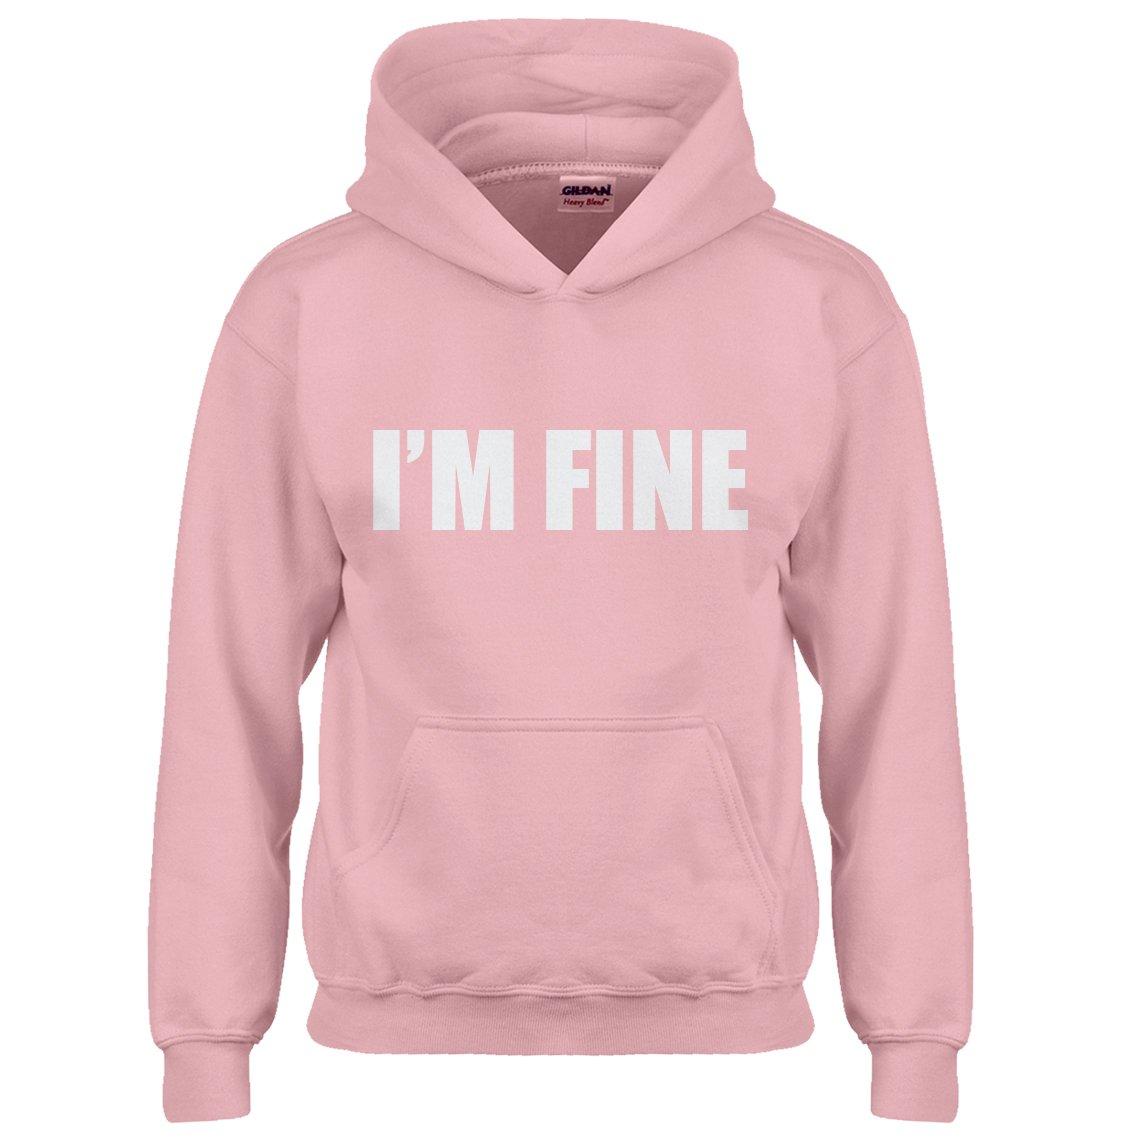 Indica Plateau Kids Hoodie I'm Fine Small Light Pink Hoodie